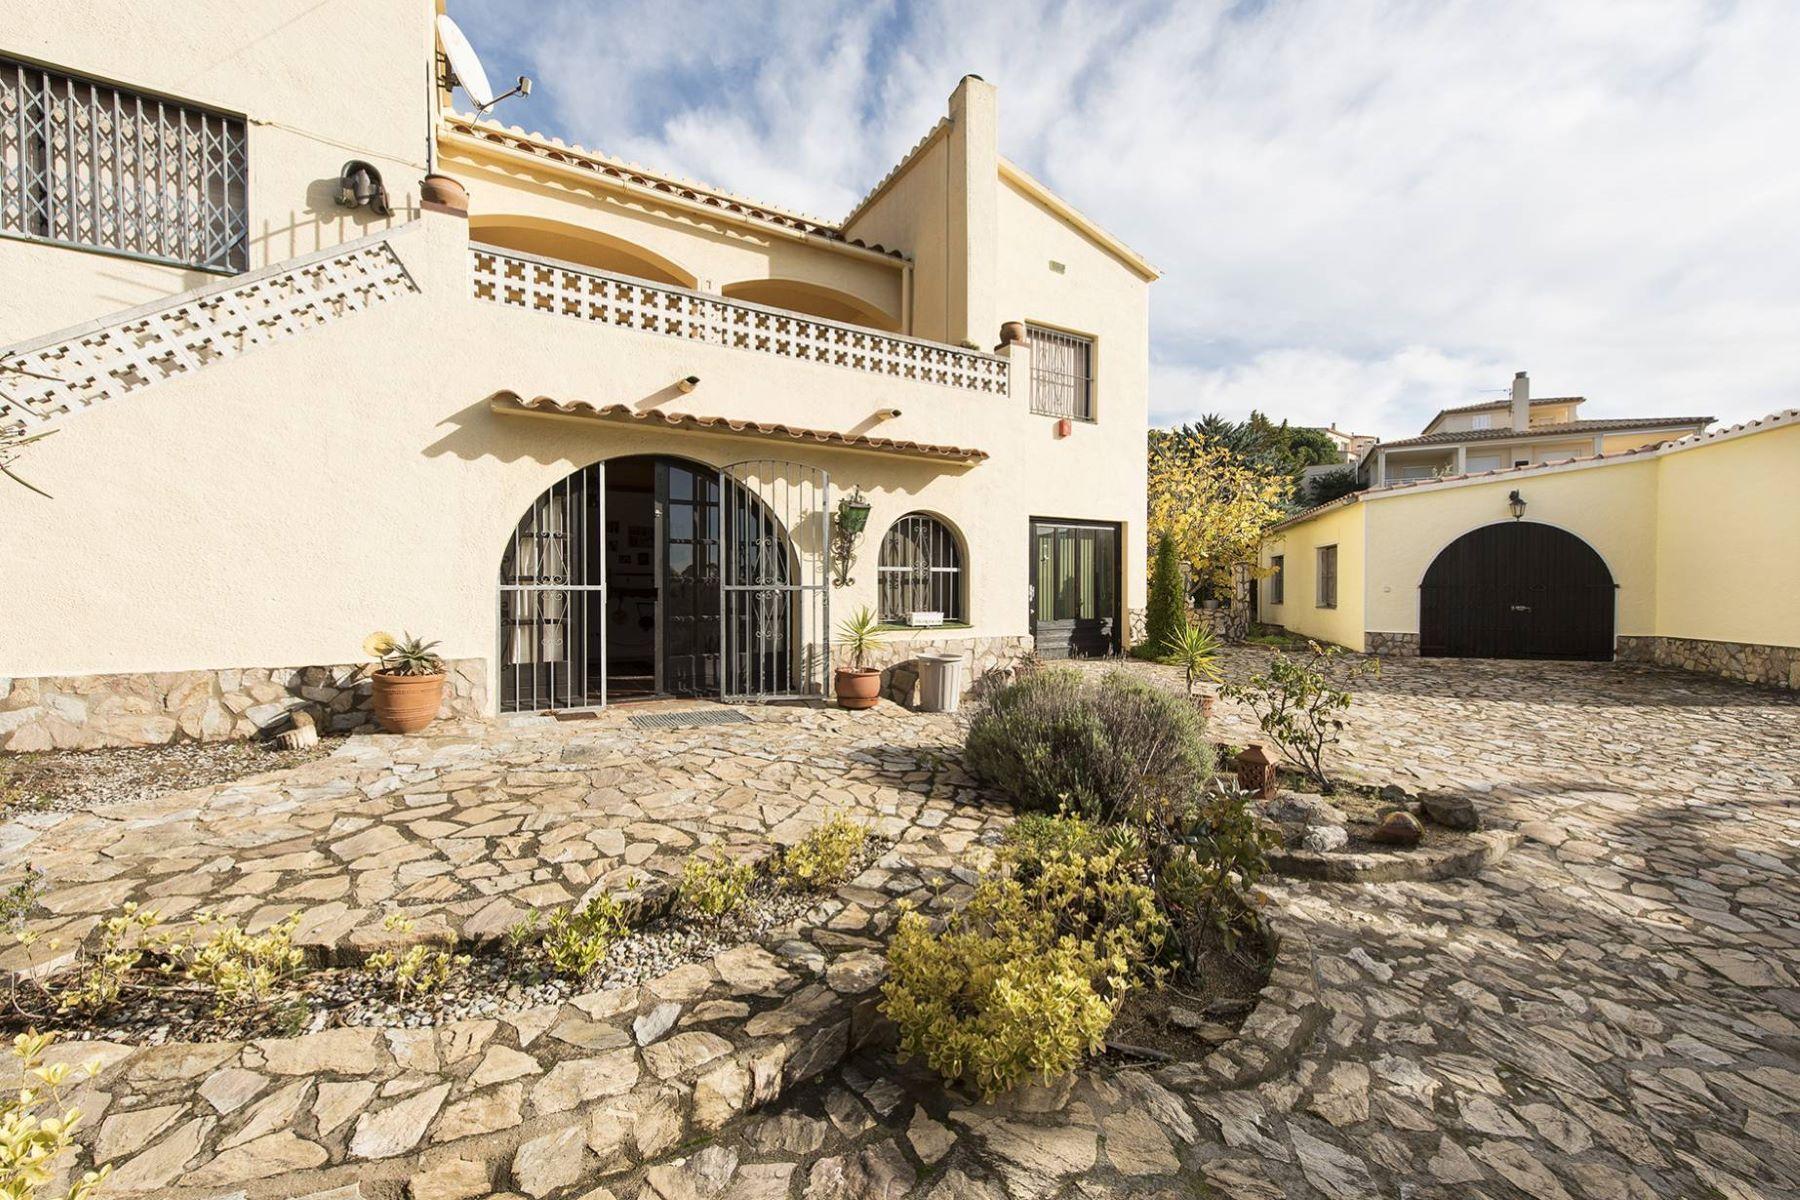 Casa Unifamiliar por un Venta en Beautiful property on the edge of the natural park Roses, Costa Brava, 17480 España